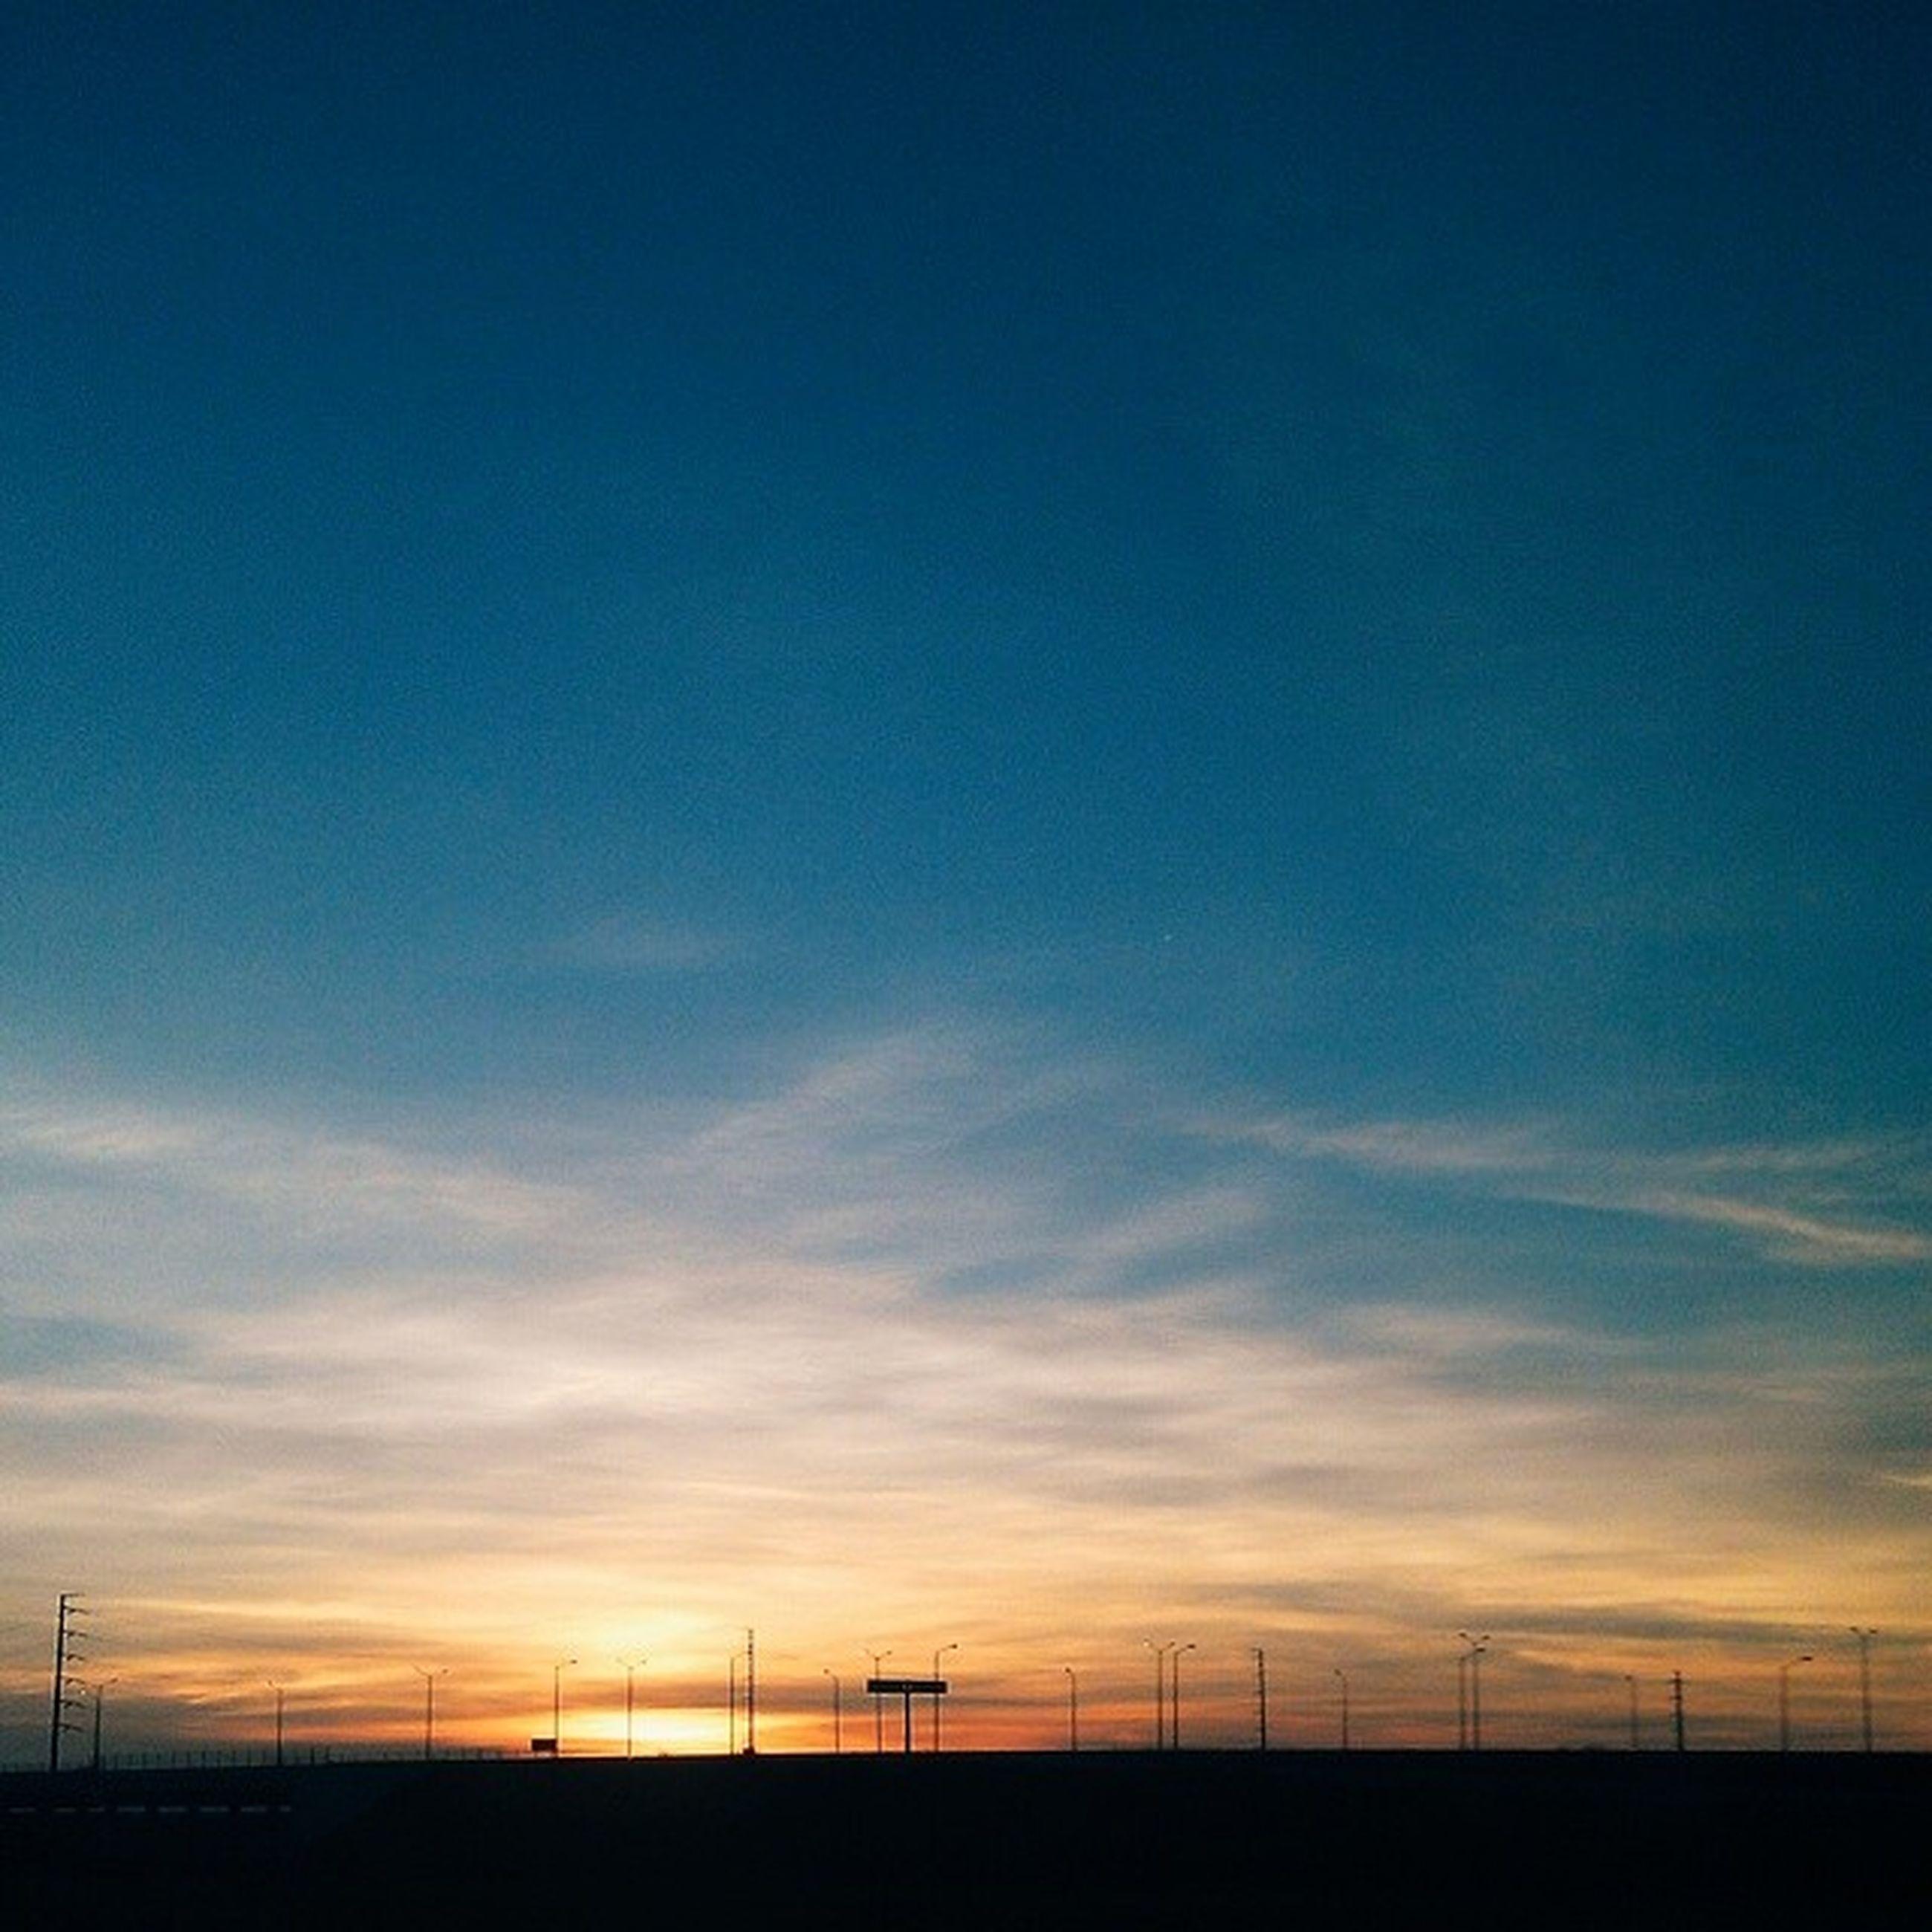 sky, sunset, scenics, tranquility, tranquil scene, landscape, beauty in nature, blue, silhouette, field, nature, cloud - sky, cloud, fence, idyllic, horizon over land, dusk, copy space, outdoors, orange color